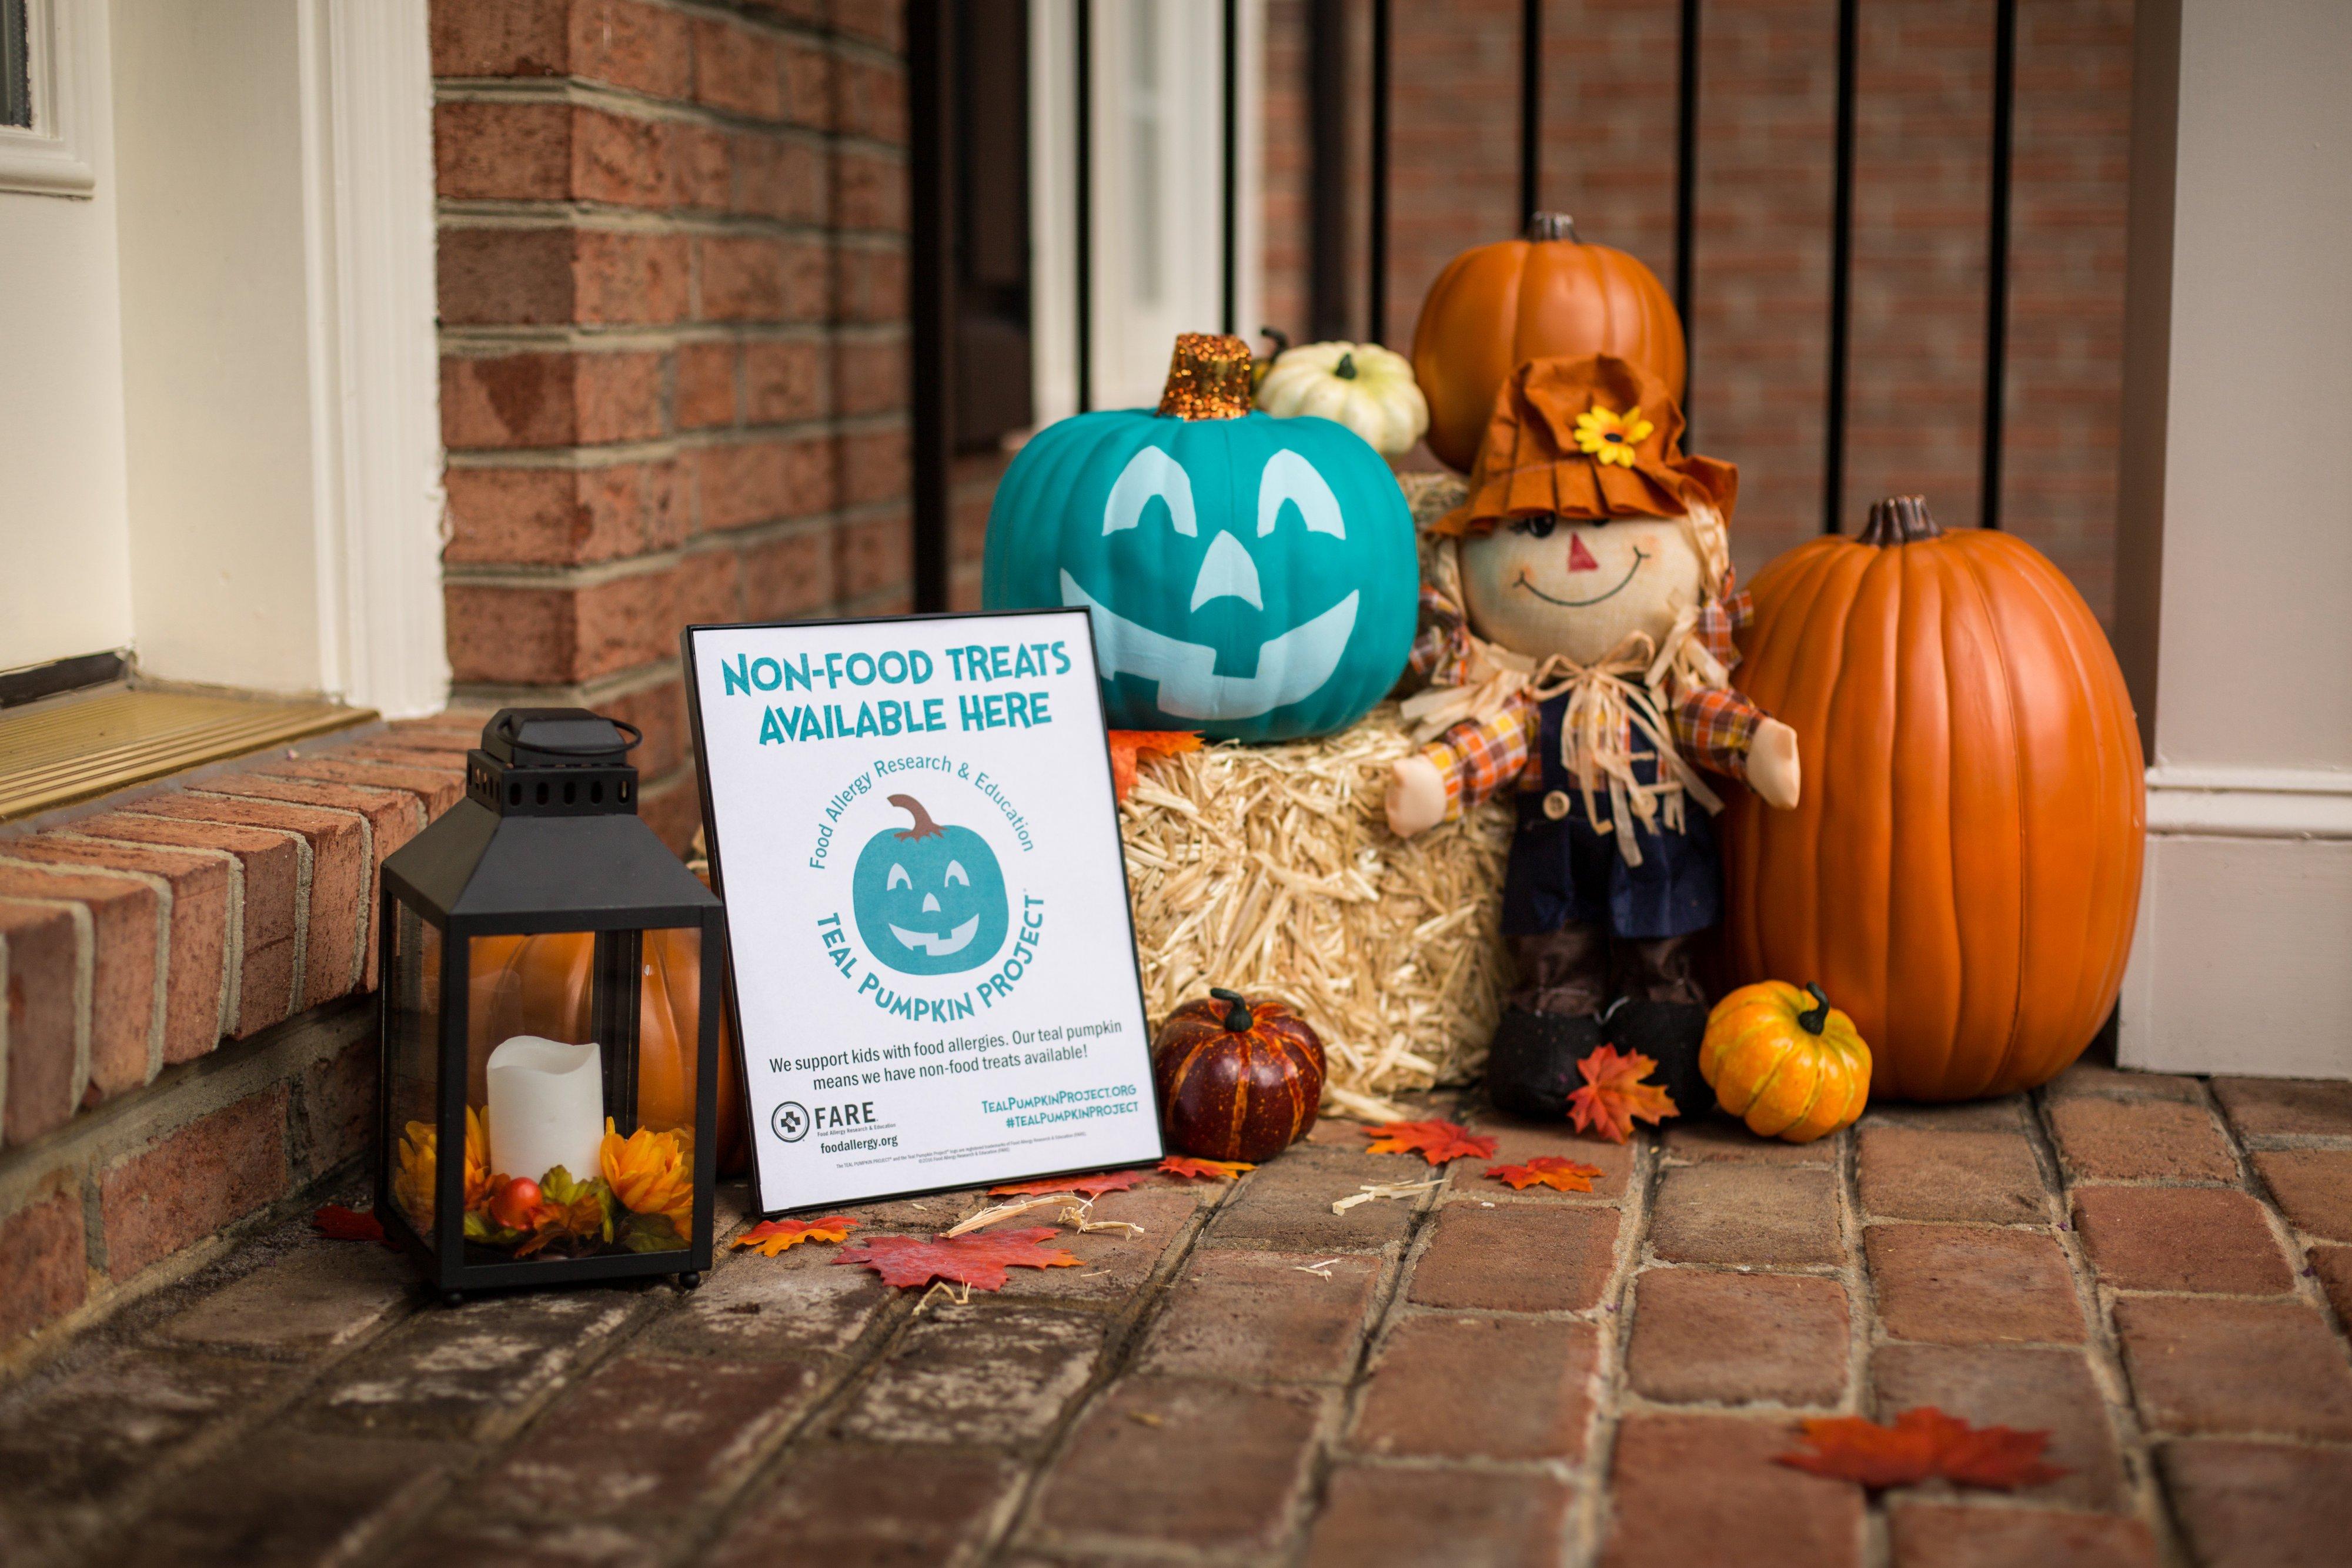 Teal Pumpkin Display With Signage